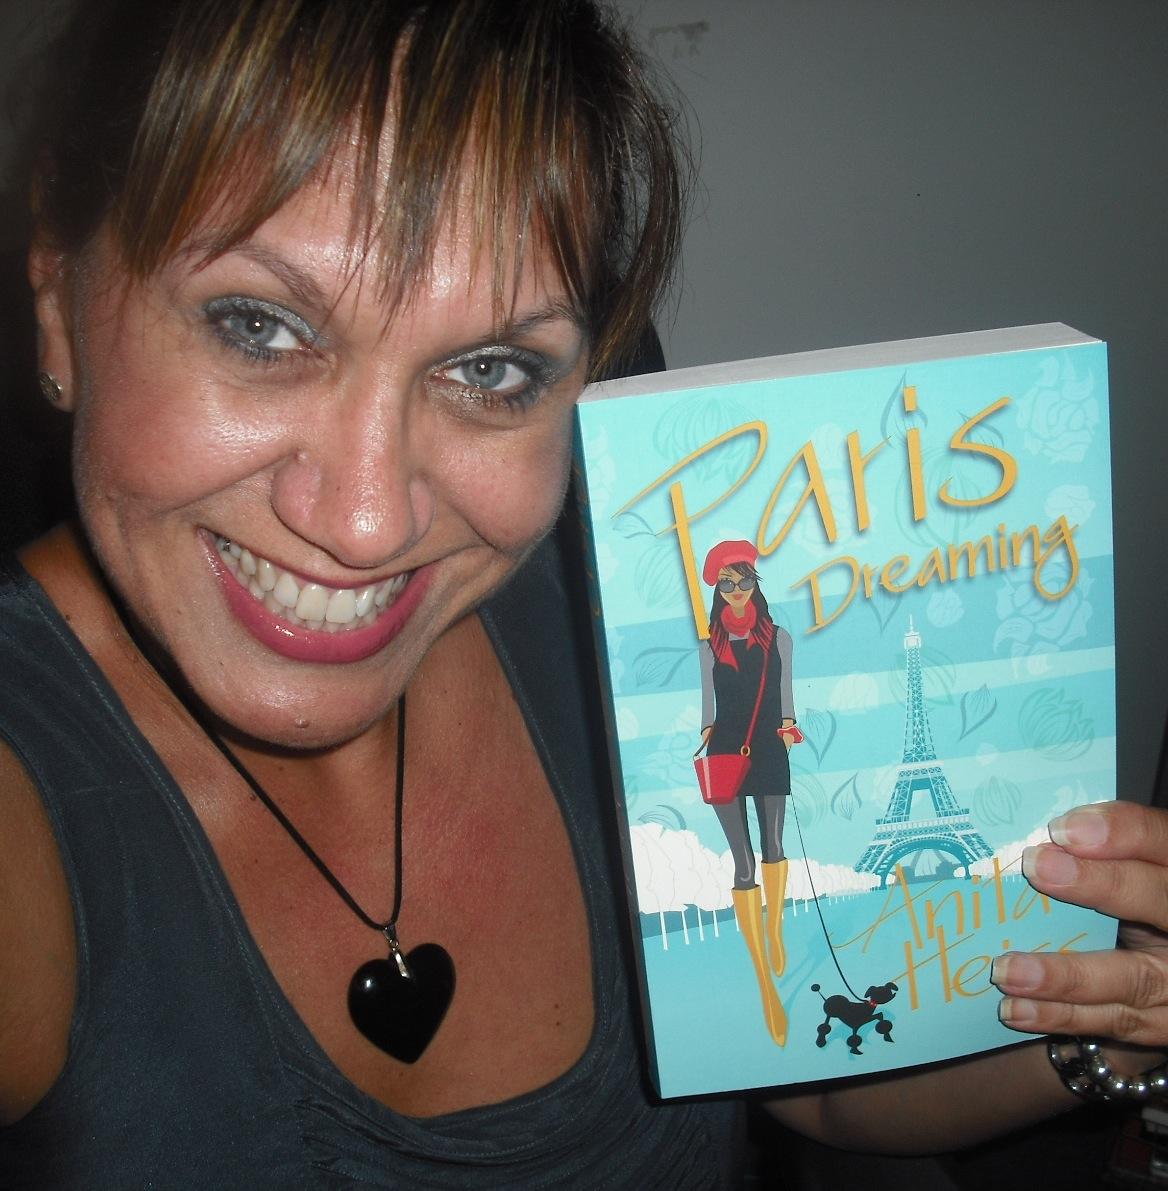 Anita Heiss Blog Paris Dreaming Has Arrived border=